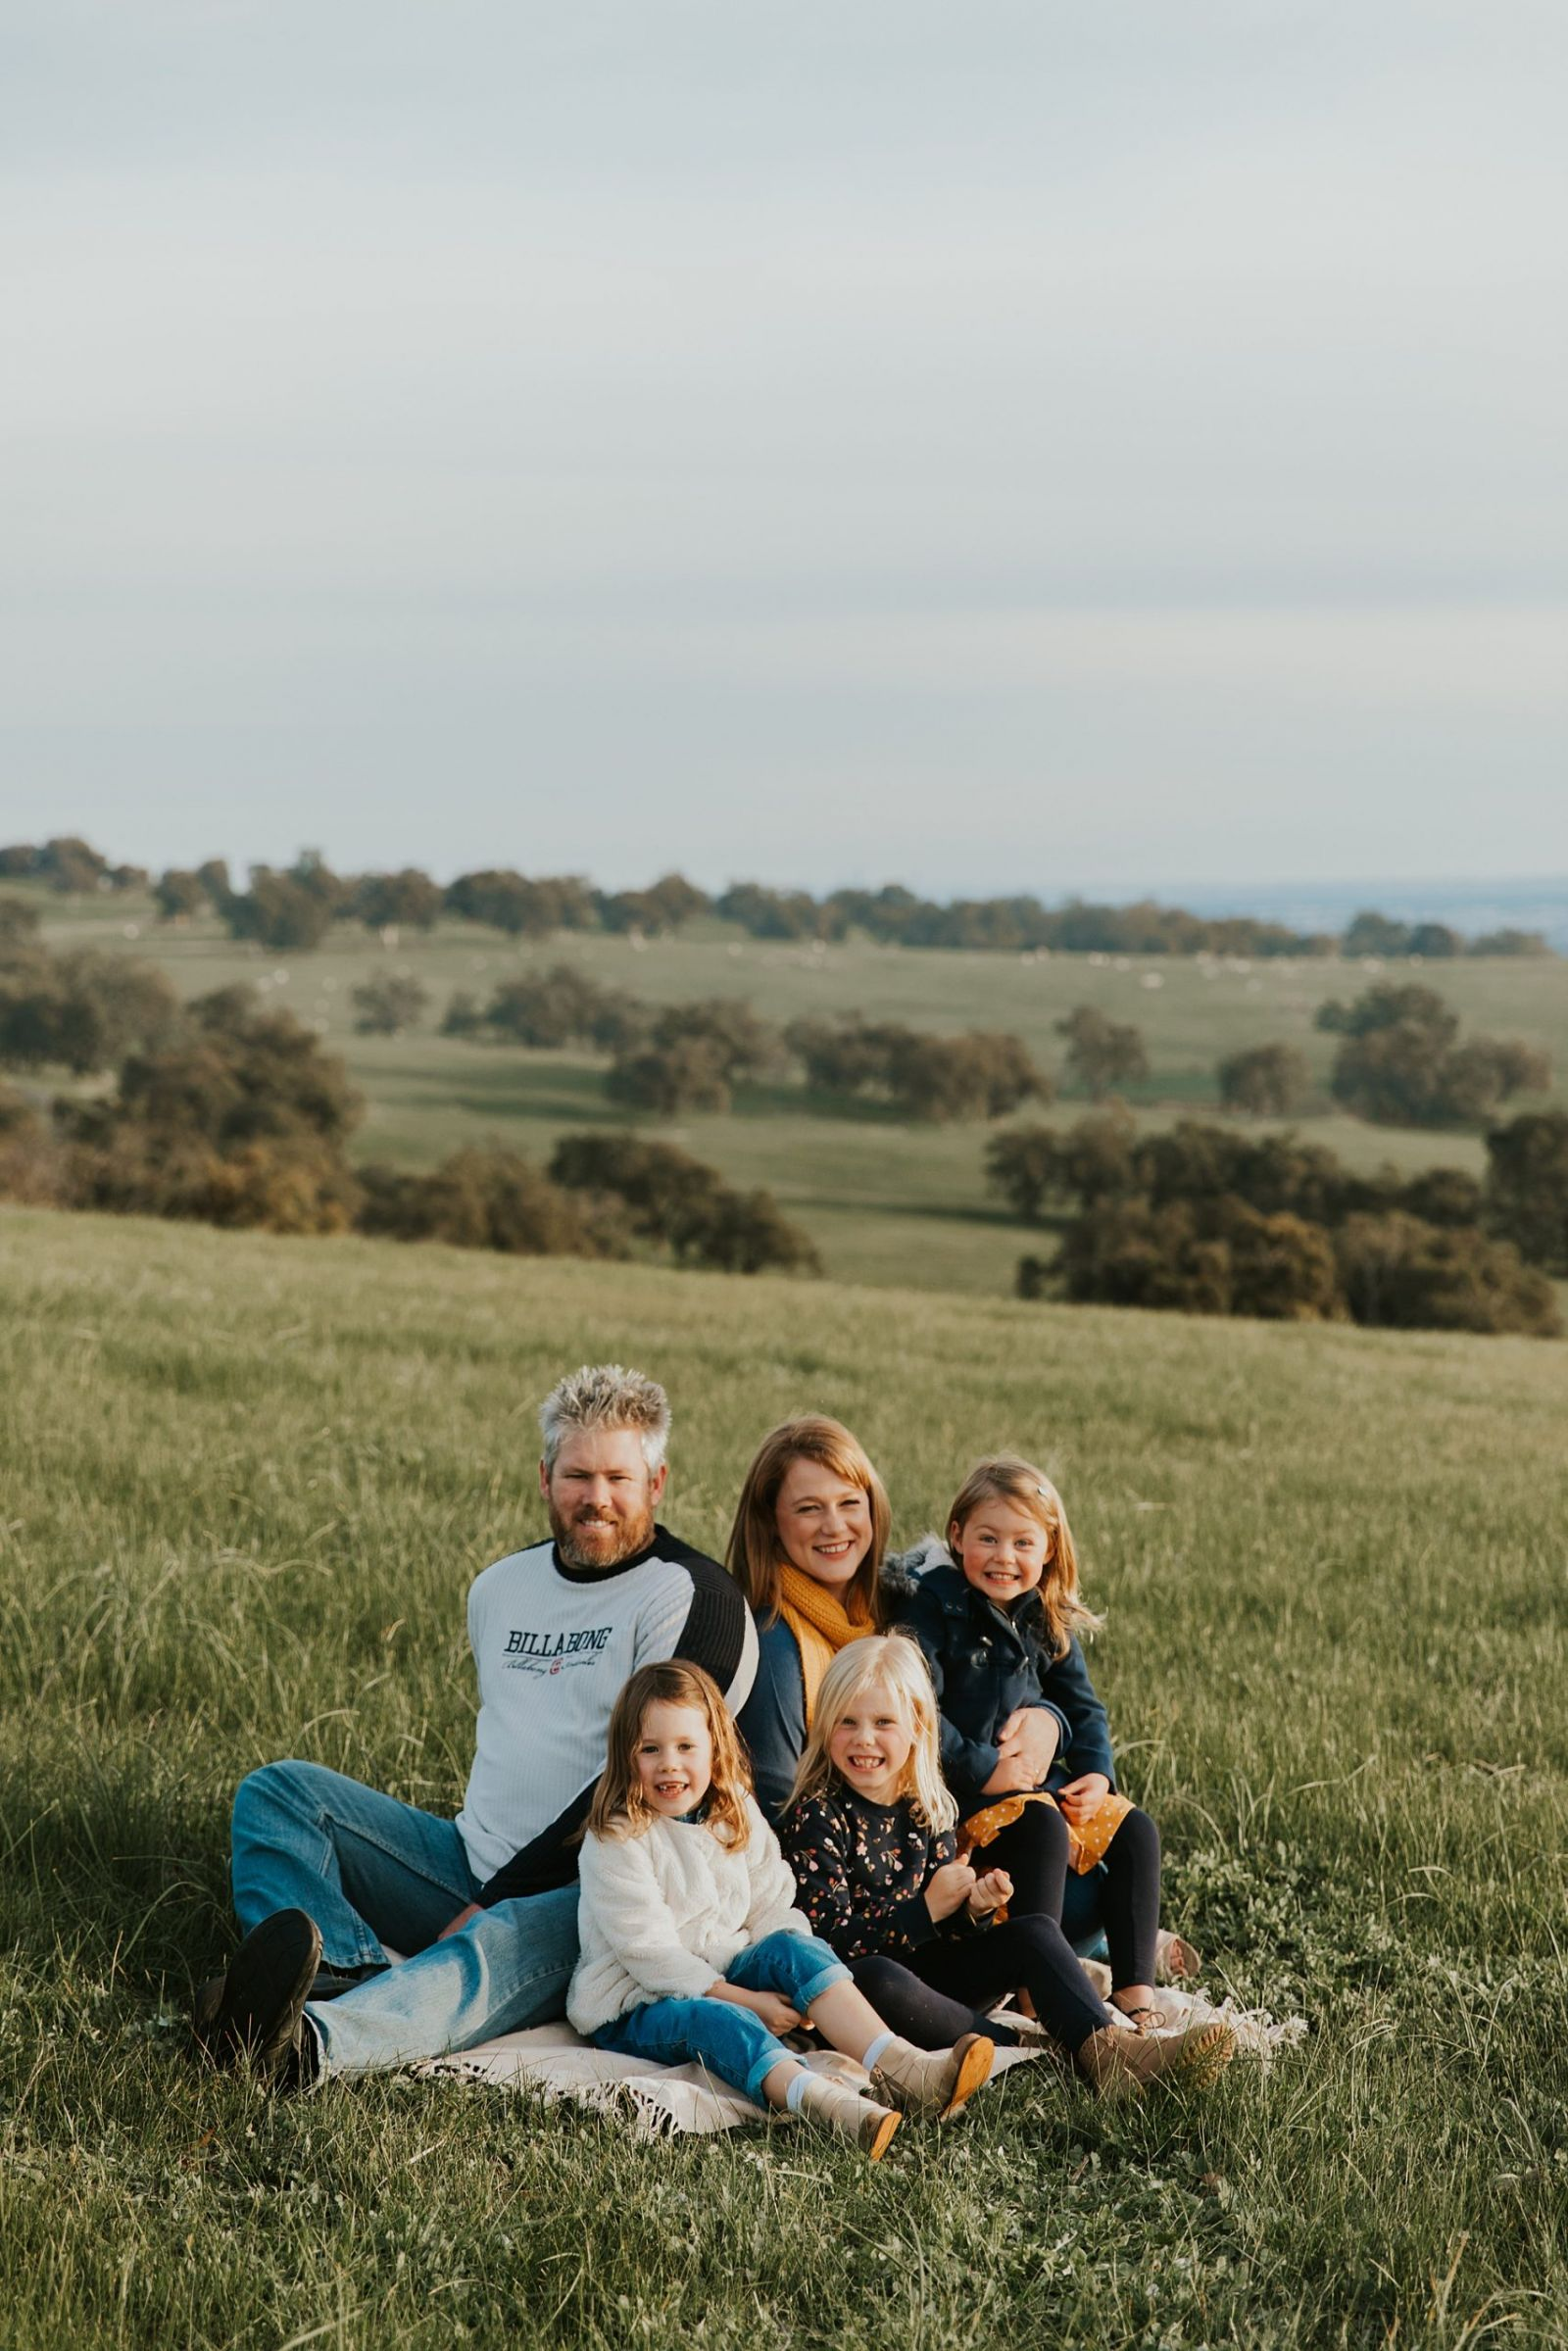 family portrait bullsbrook mustard and navy perth wa perth family photographer